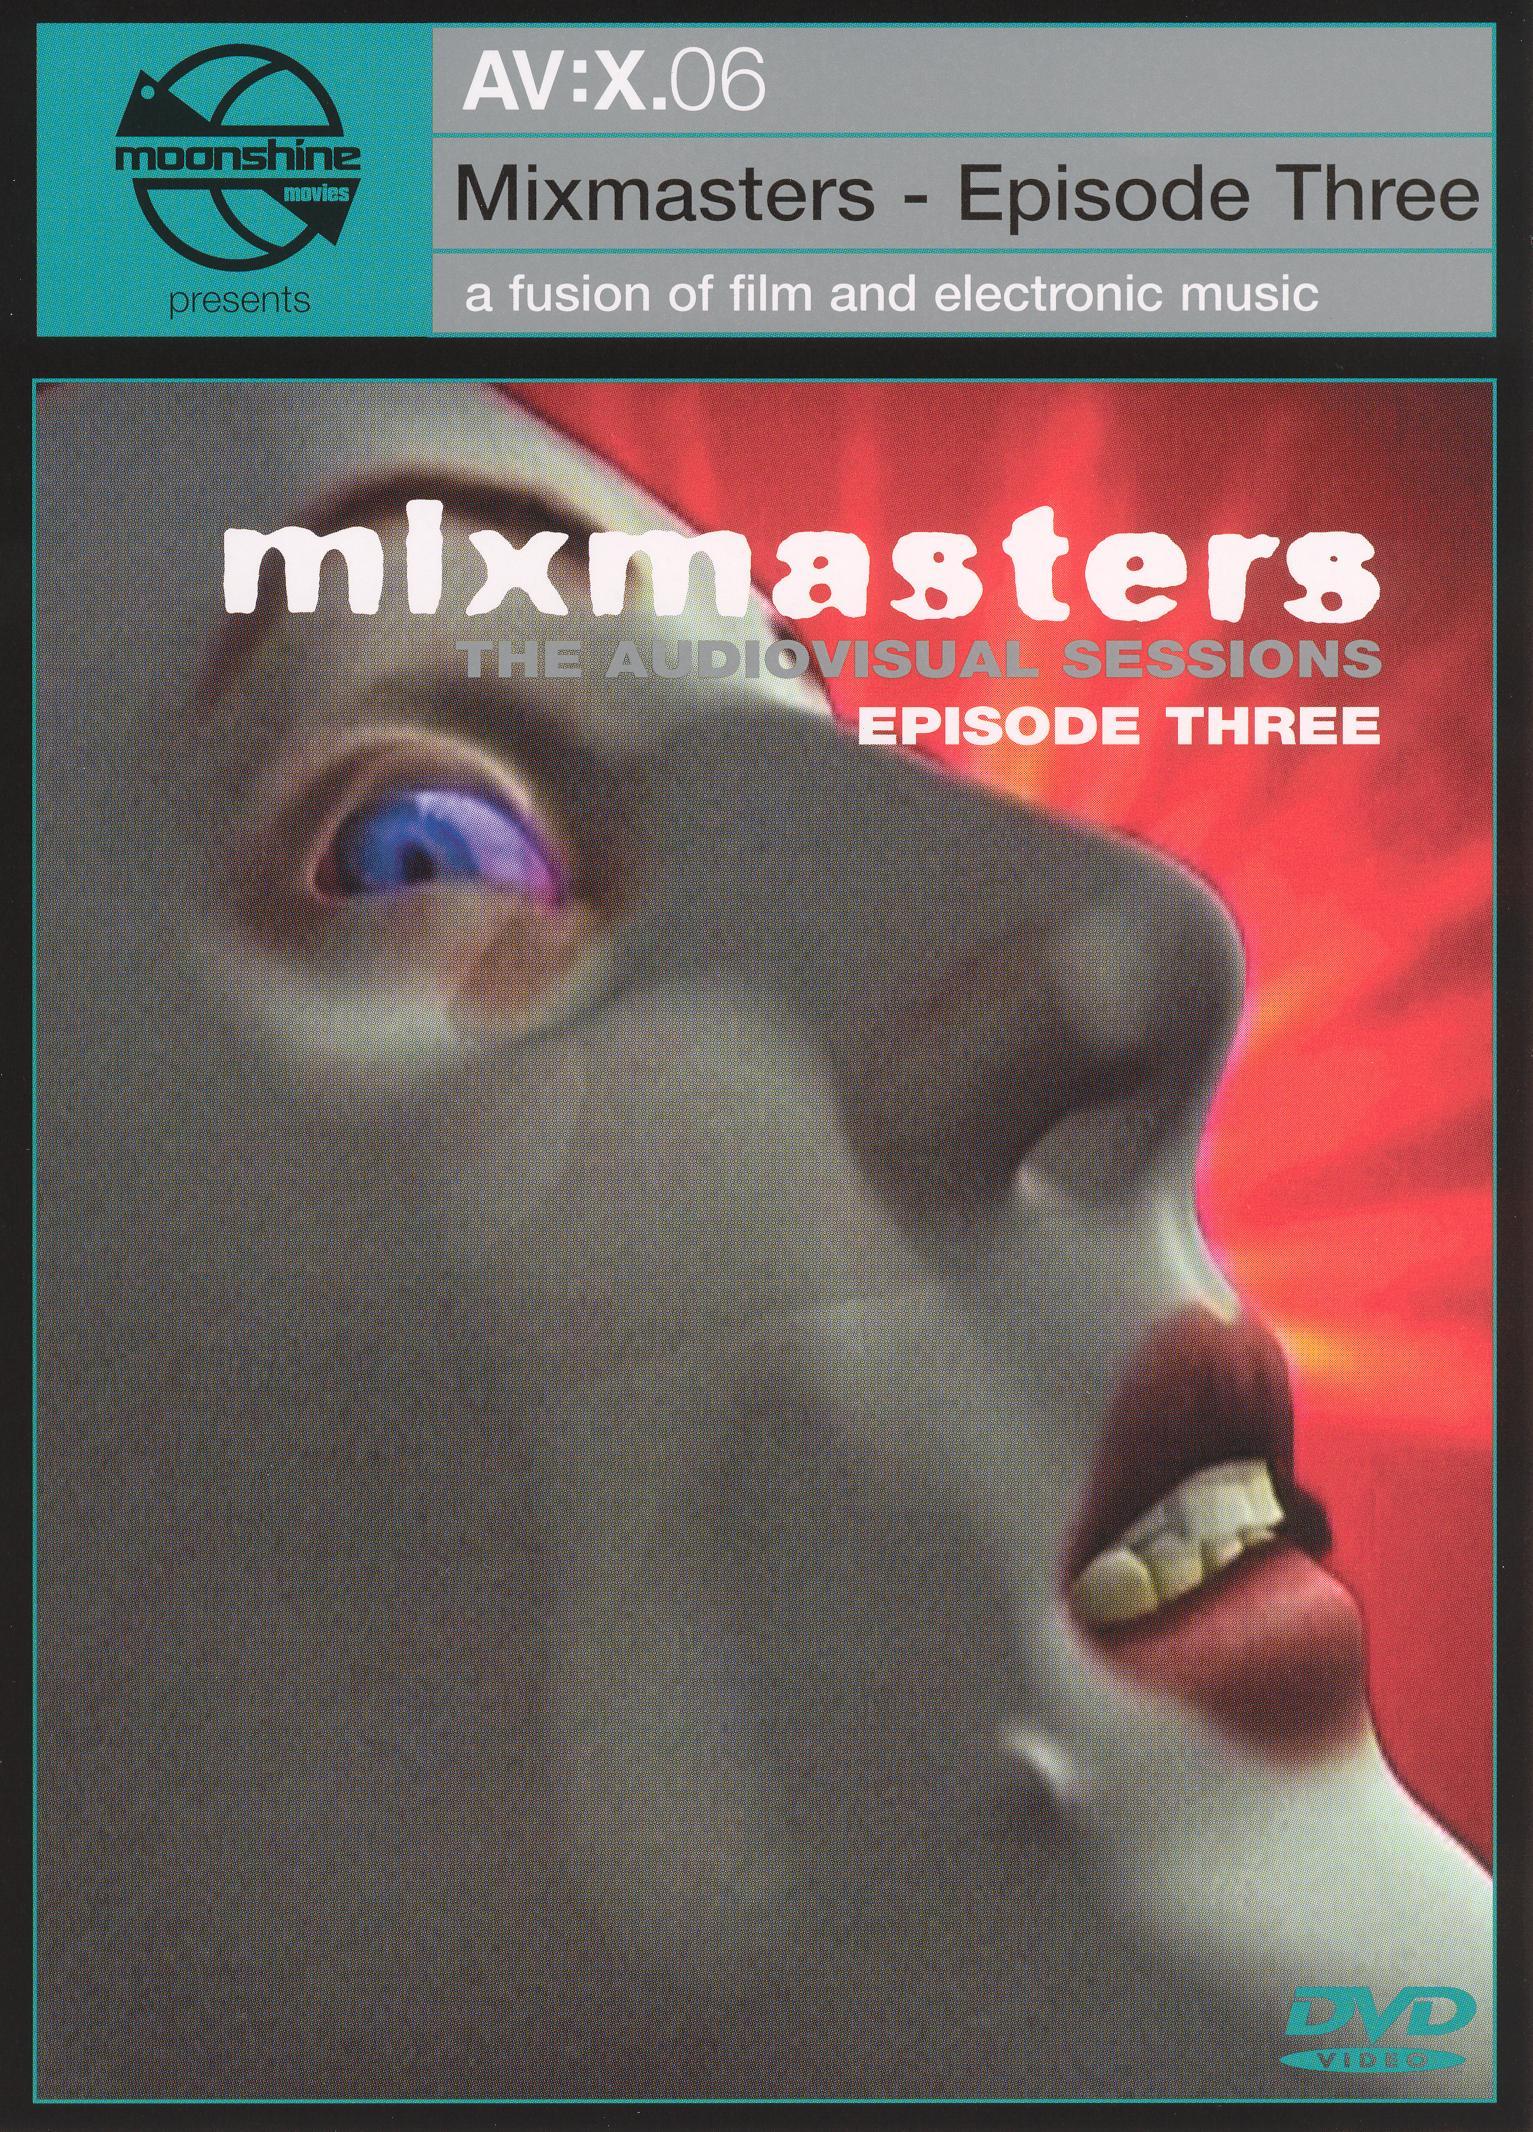 AV:X.06 - Mixmasters, Episode 3